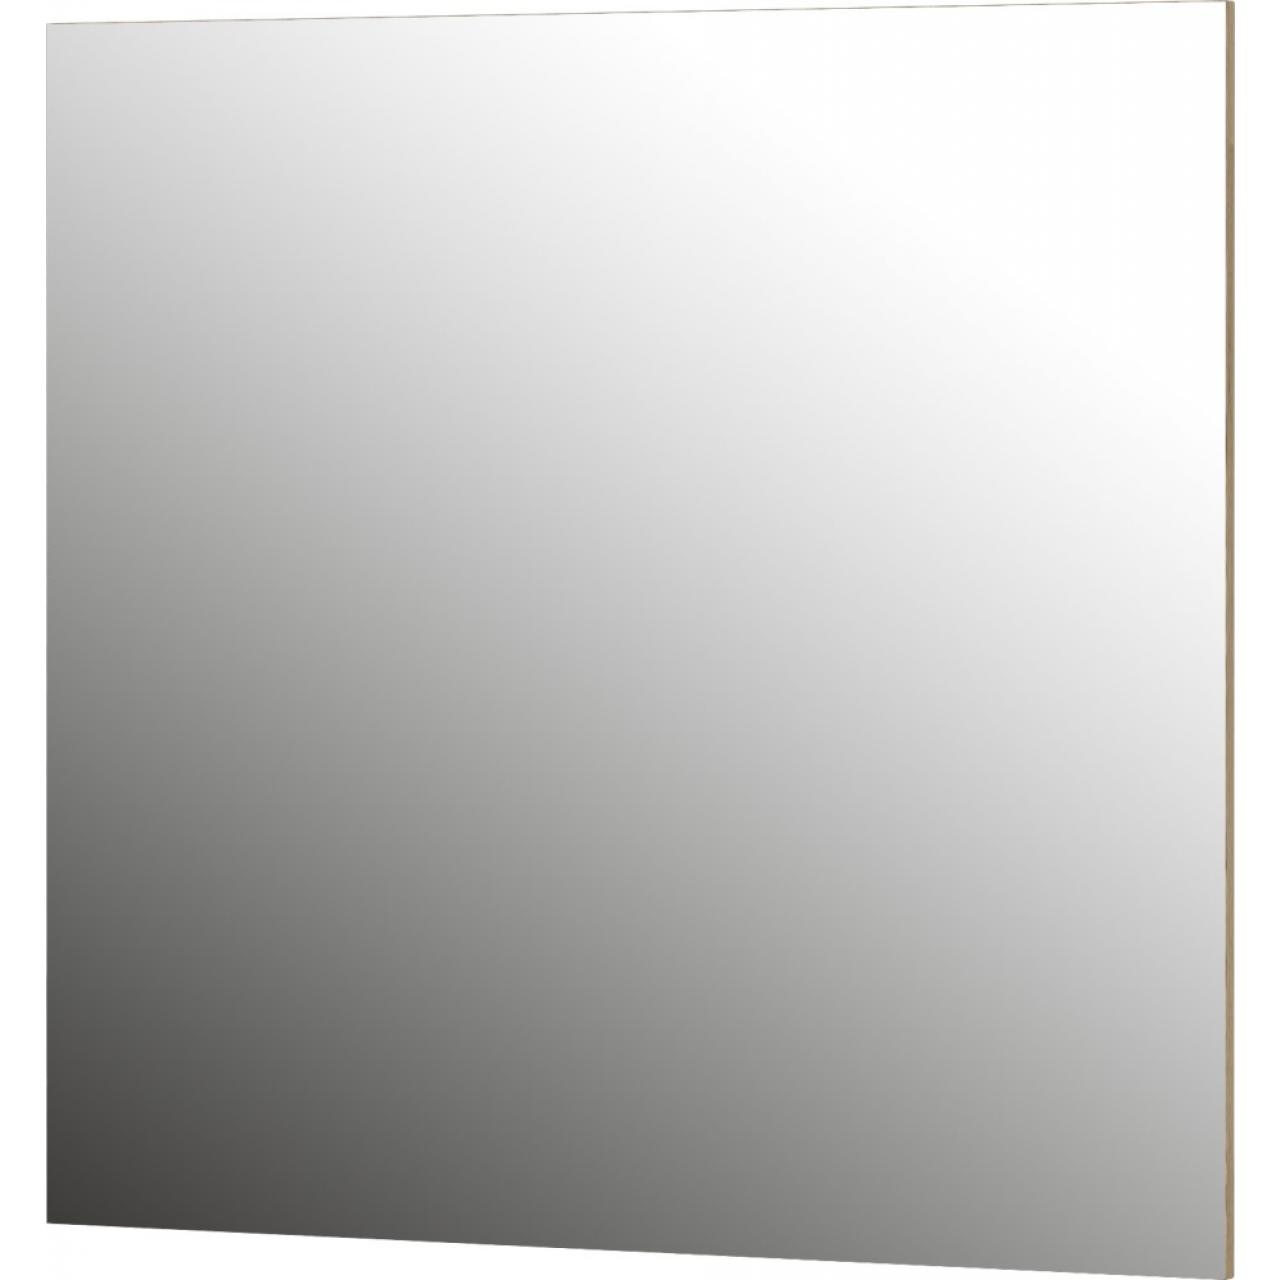 Spiegel Berlebeck Grandson Eiche Nb. Flur Diele Wandspiegel Badezimmer